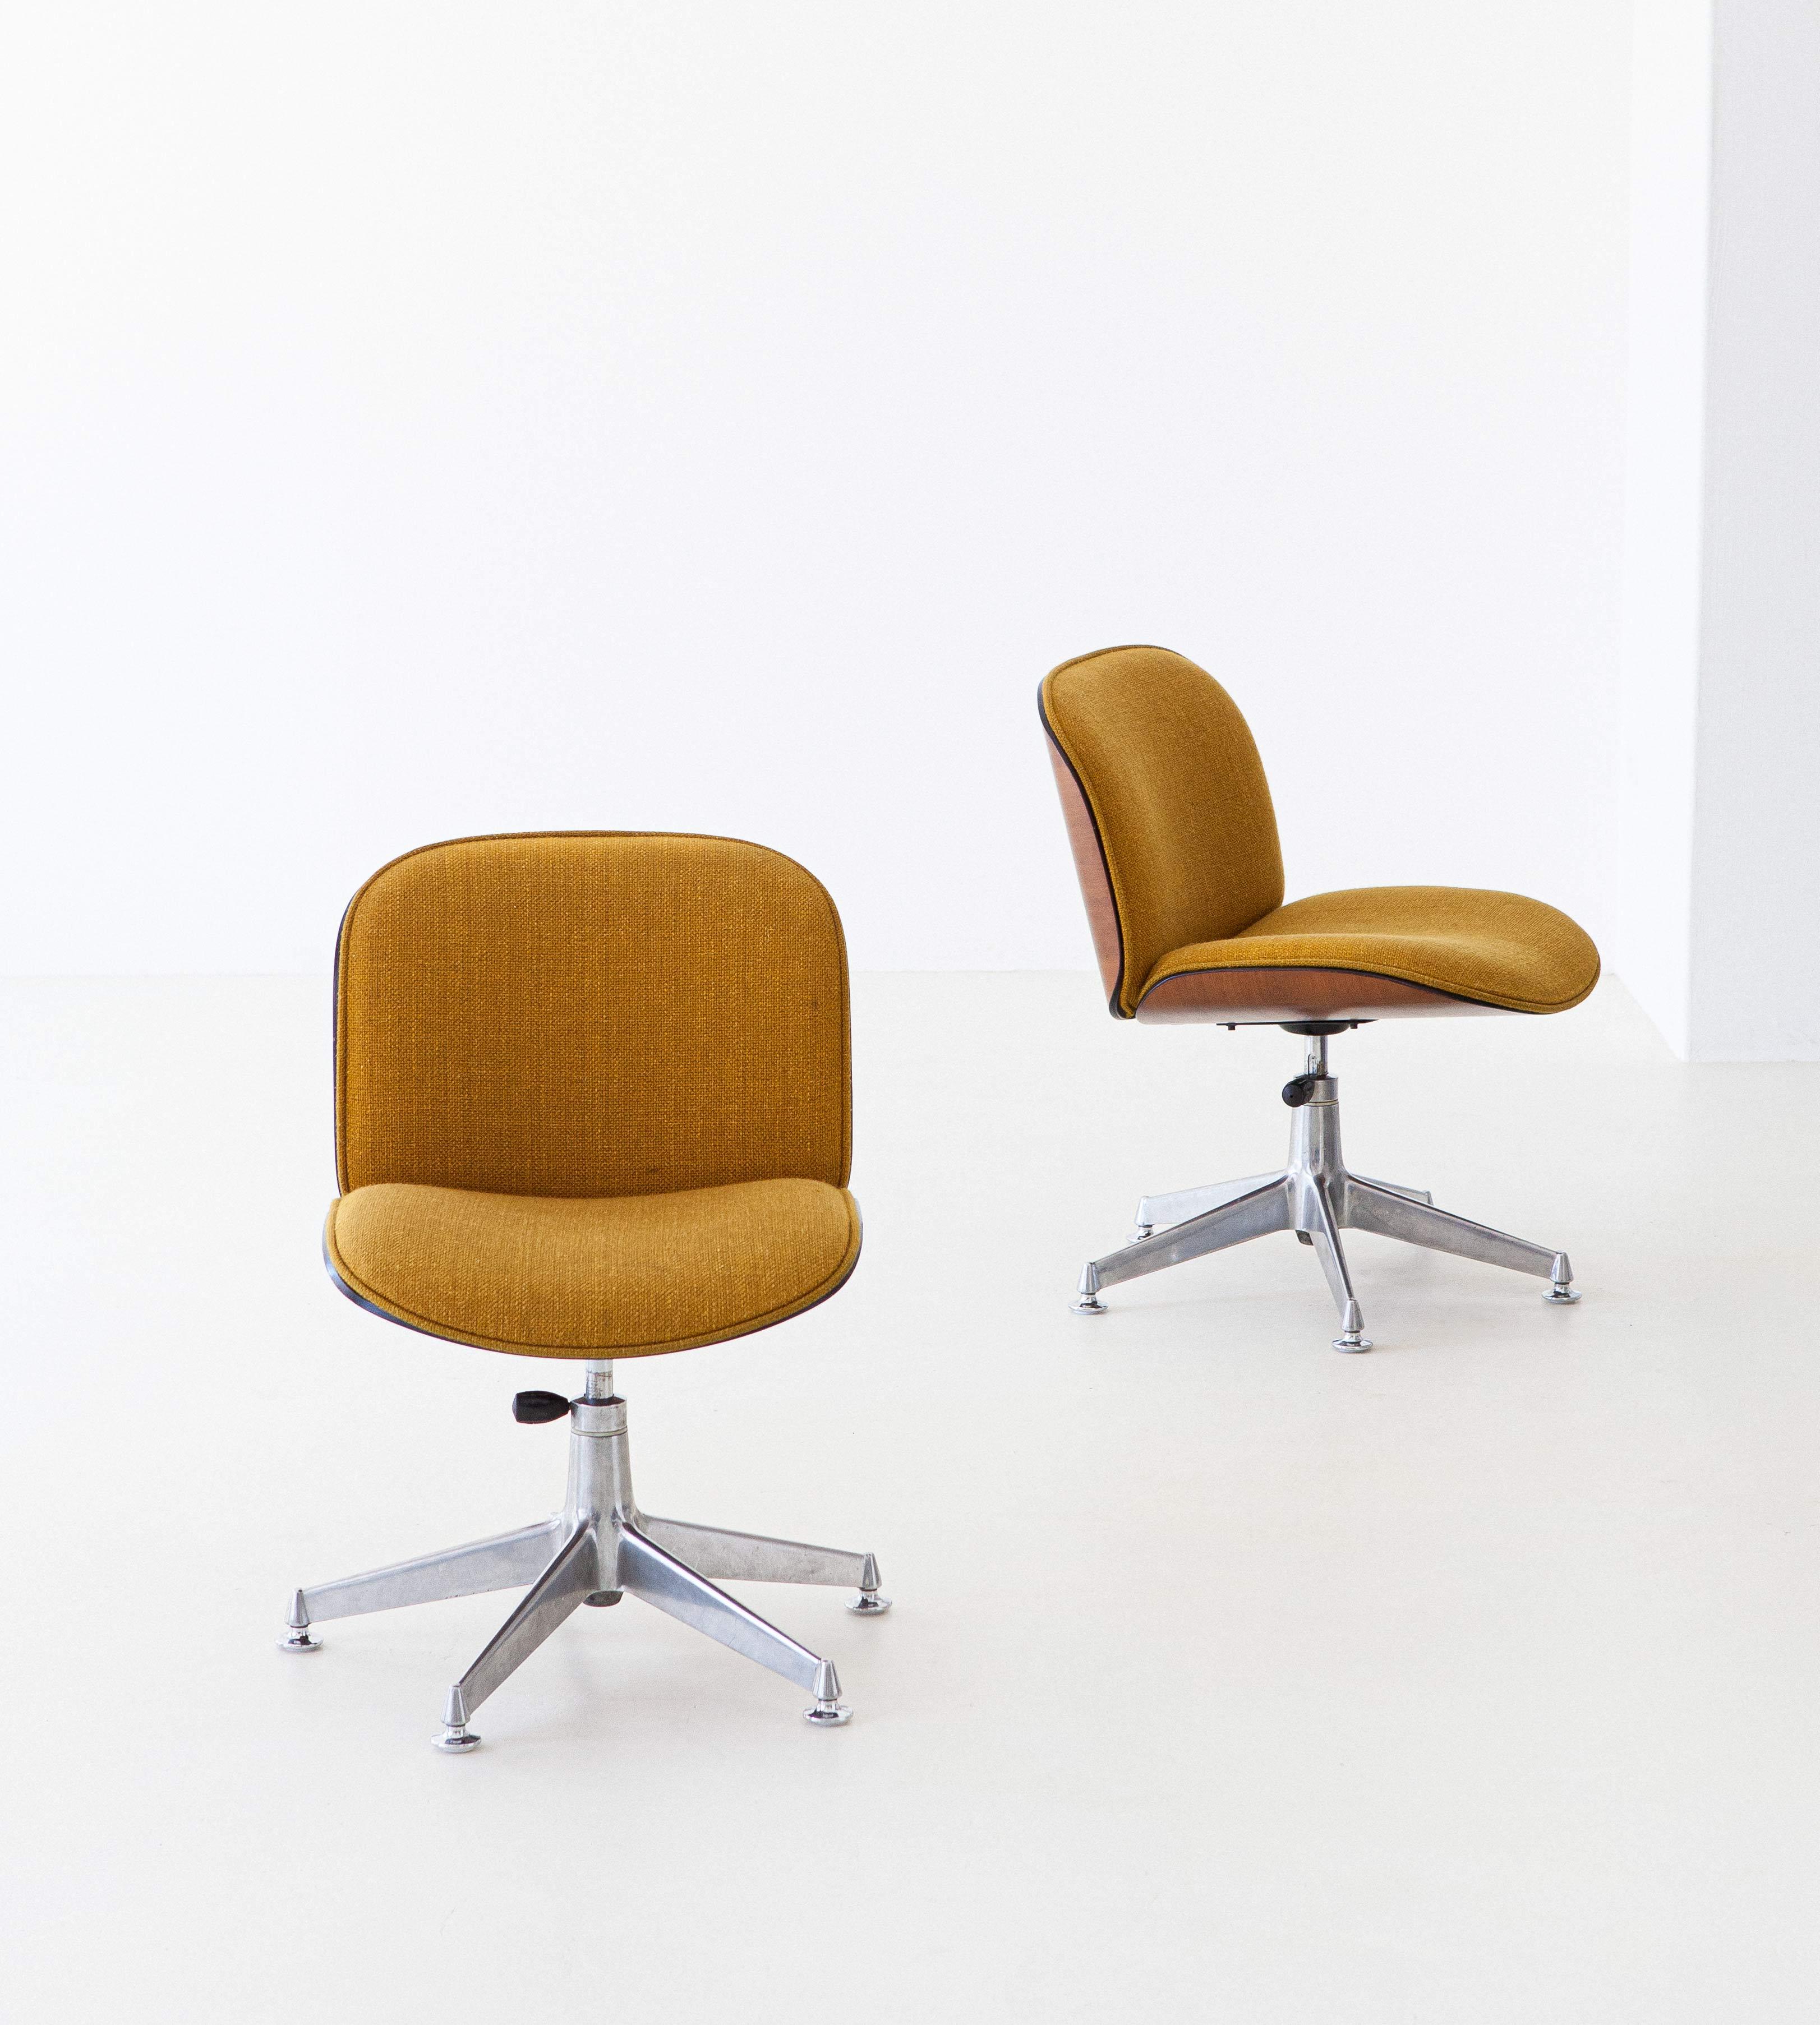 1950s-ico-parisi-for-mim-walnut-swivel-desk-chairs-2-se305